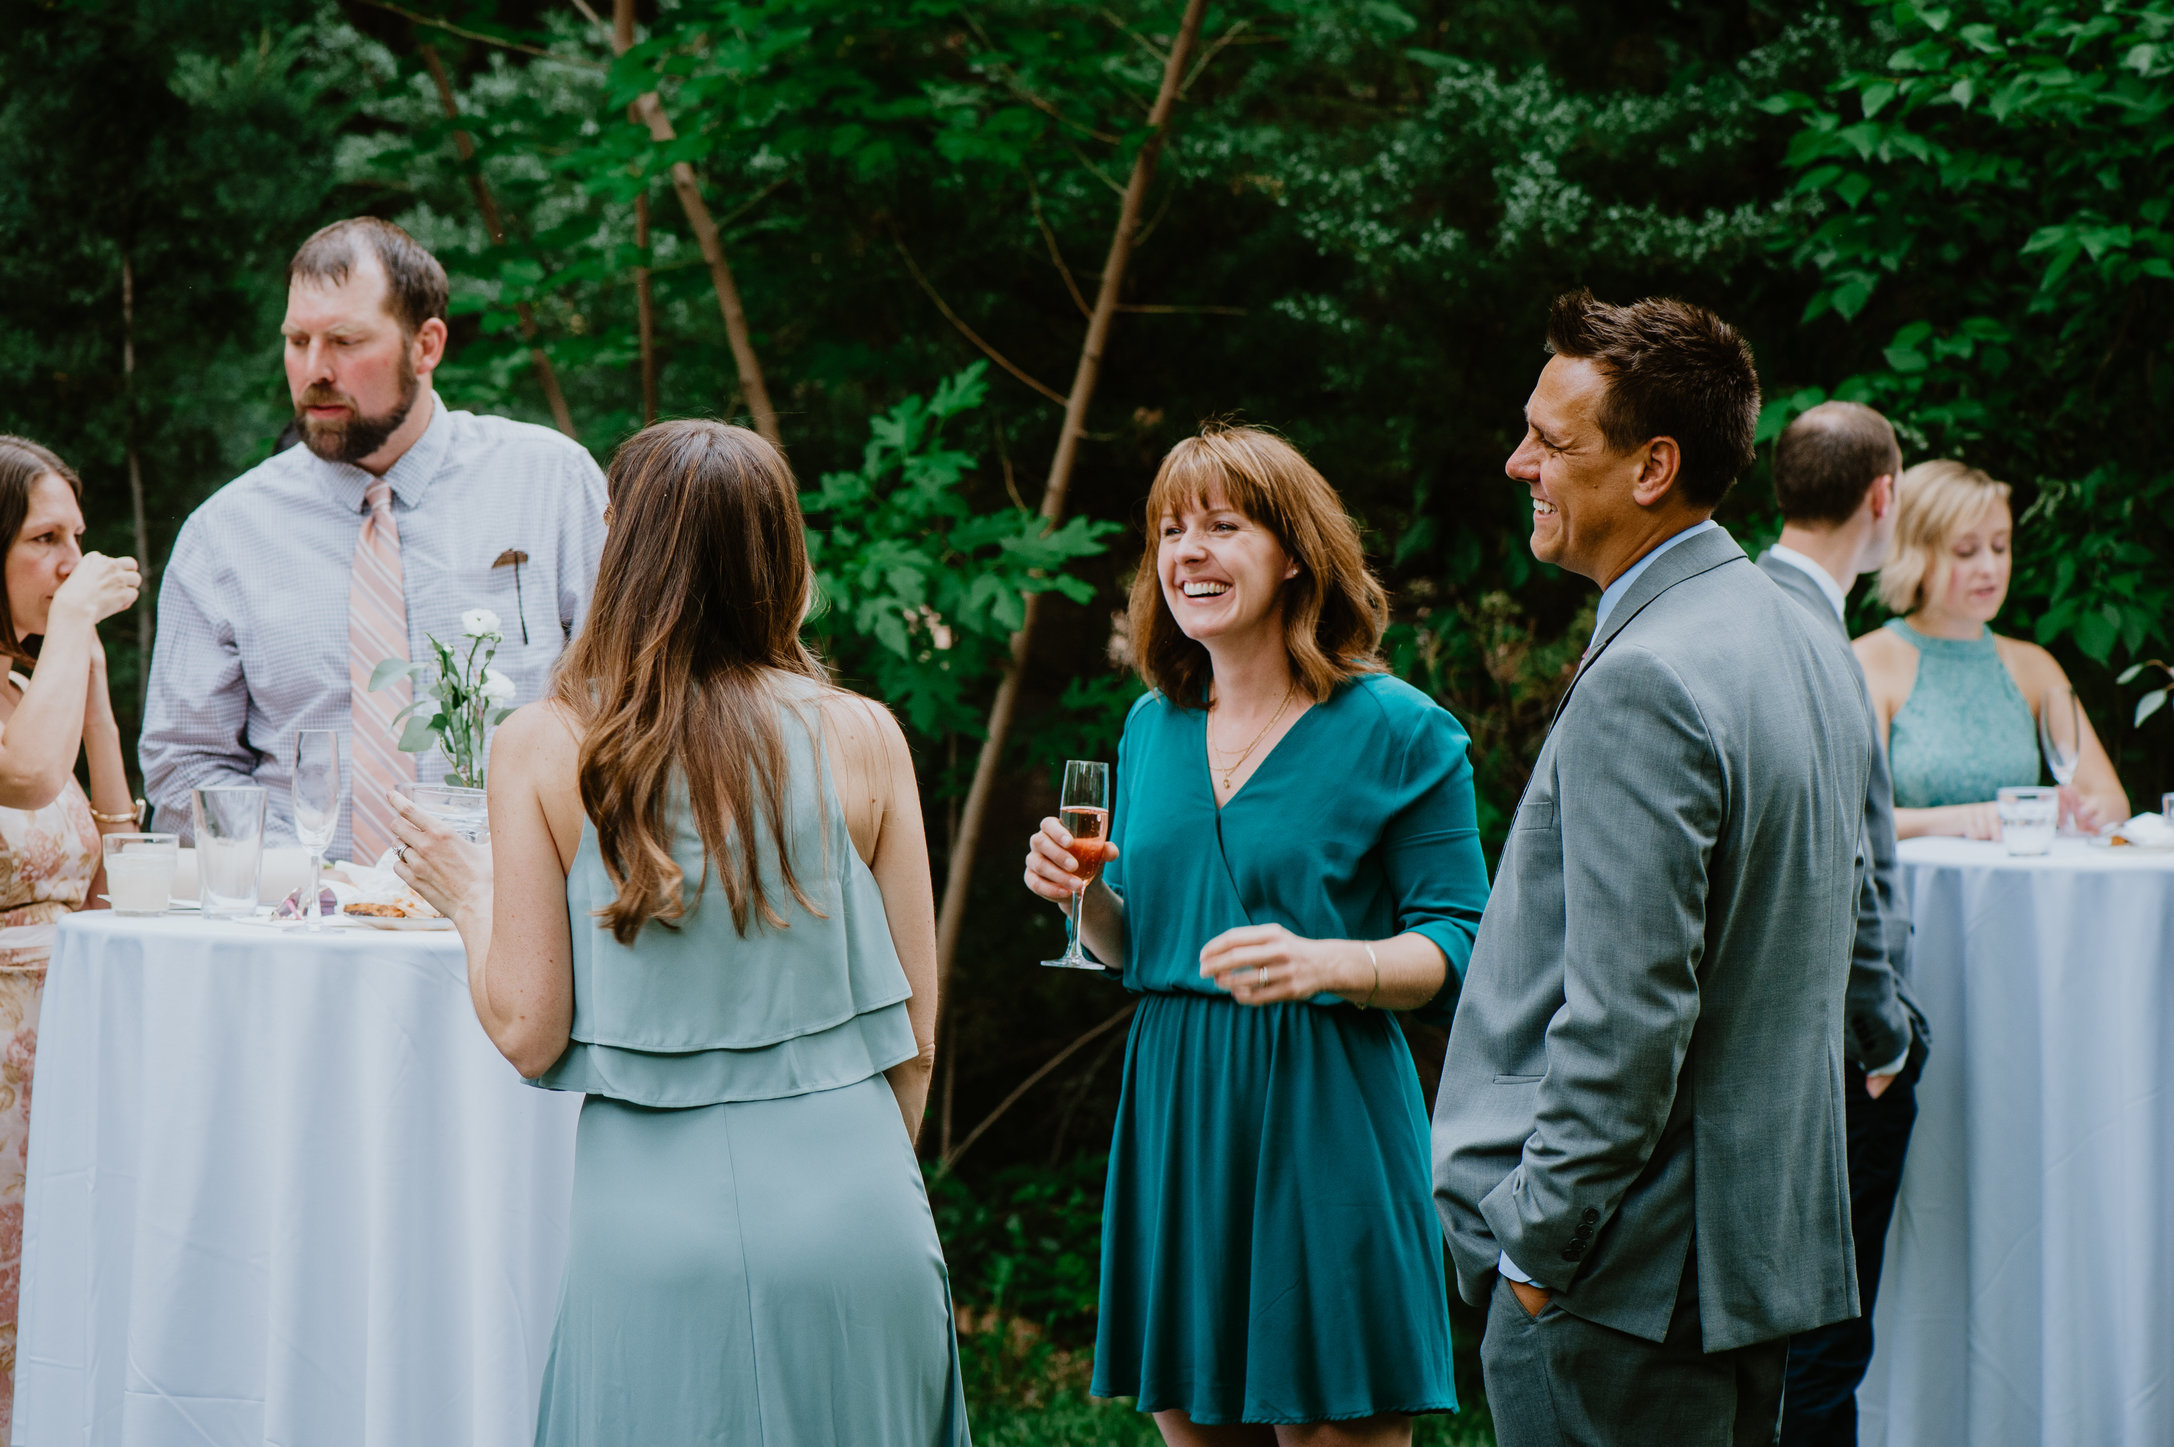 DandA-wedding-358.jpg